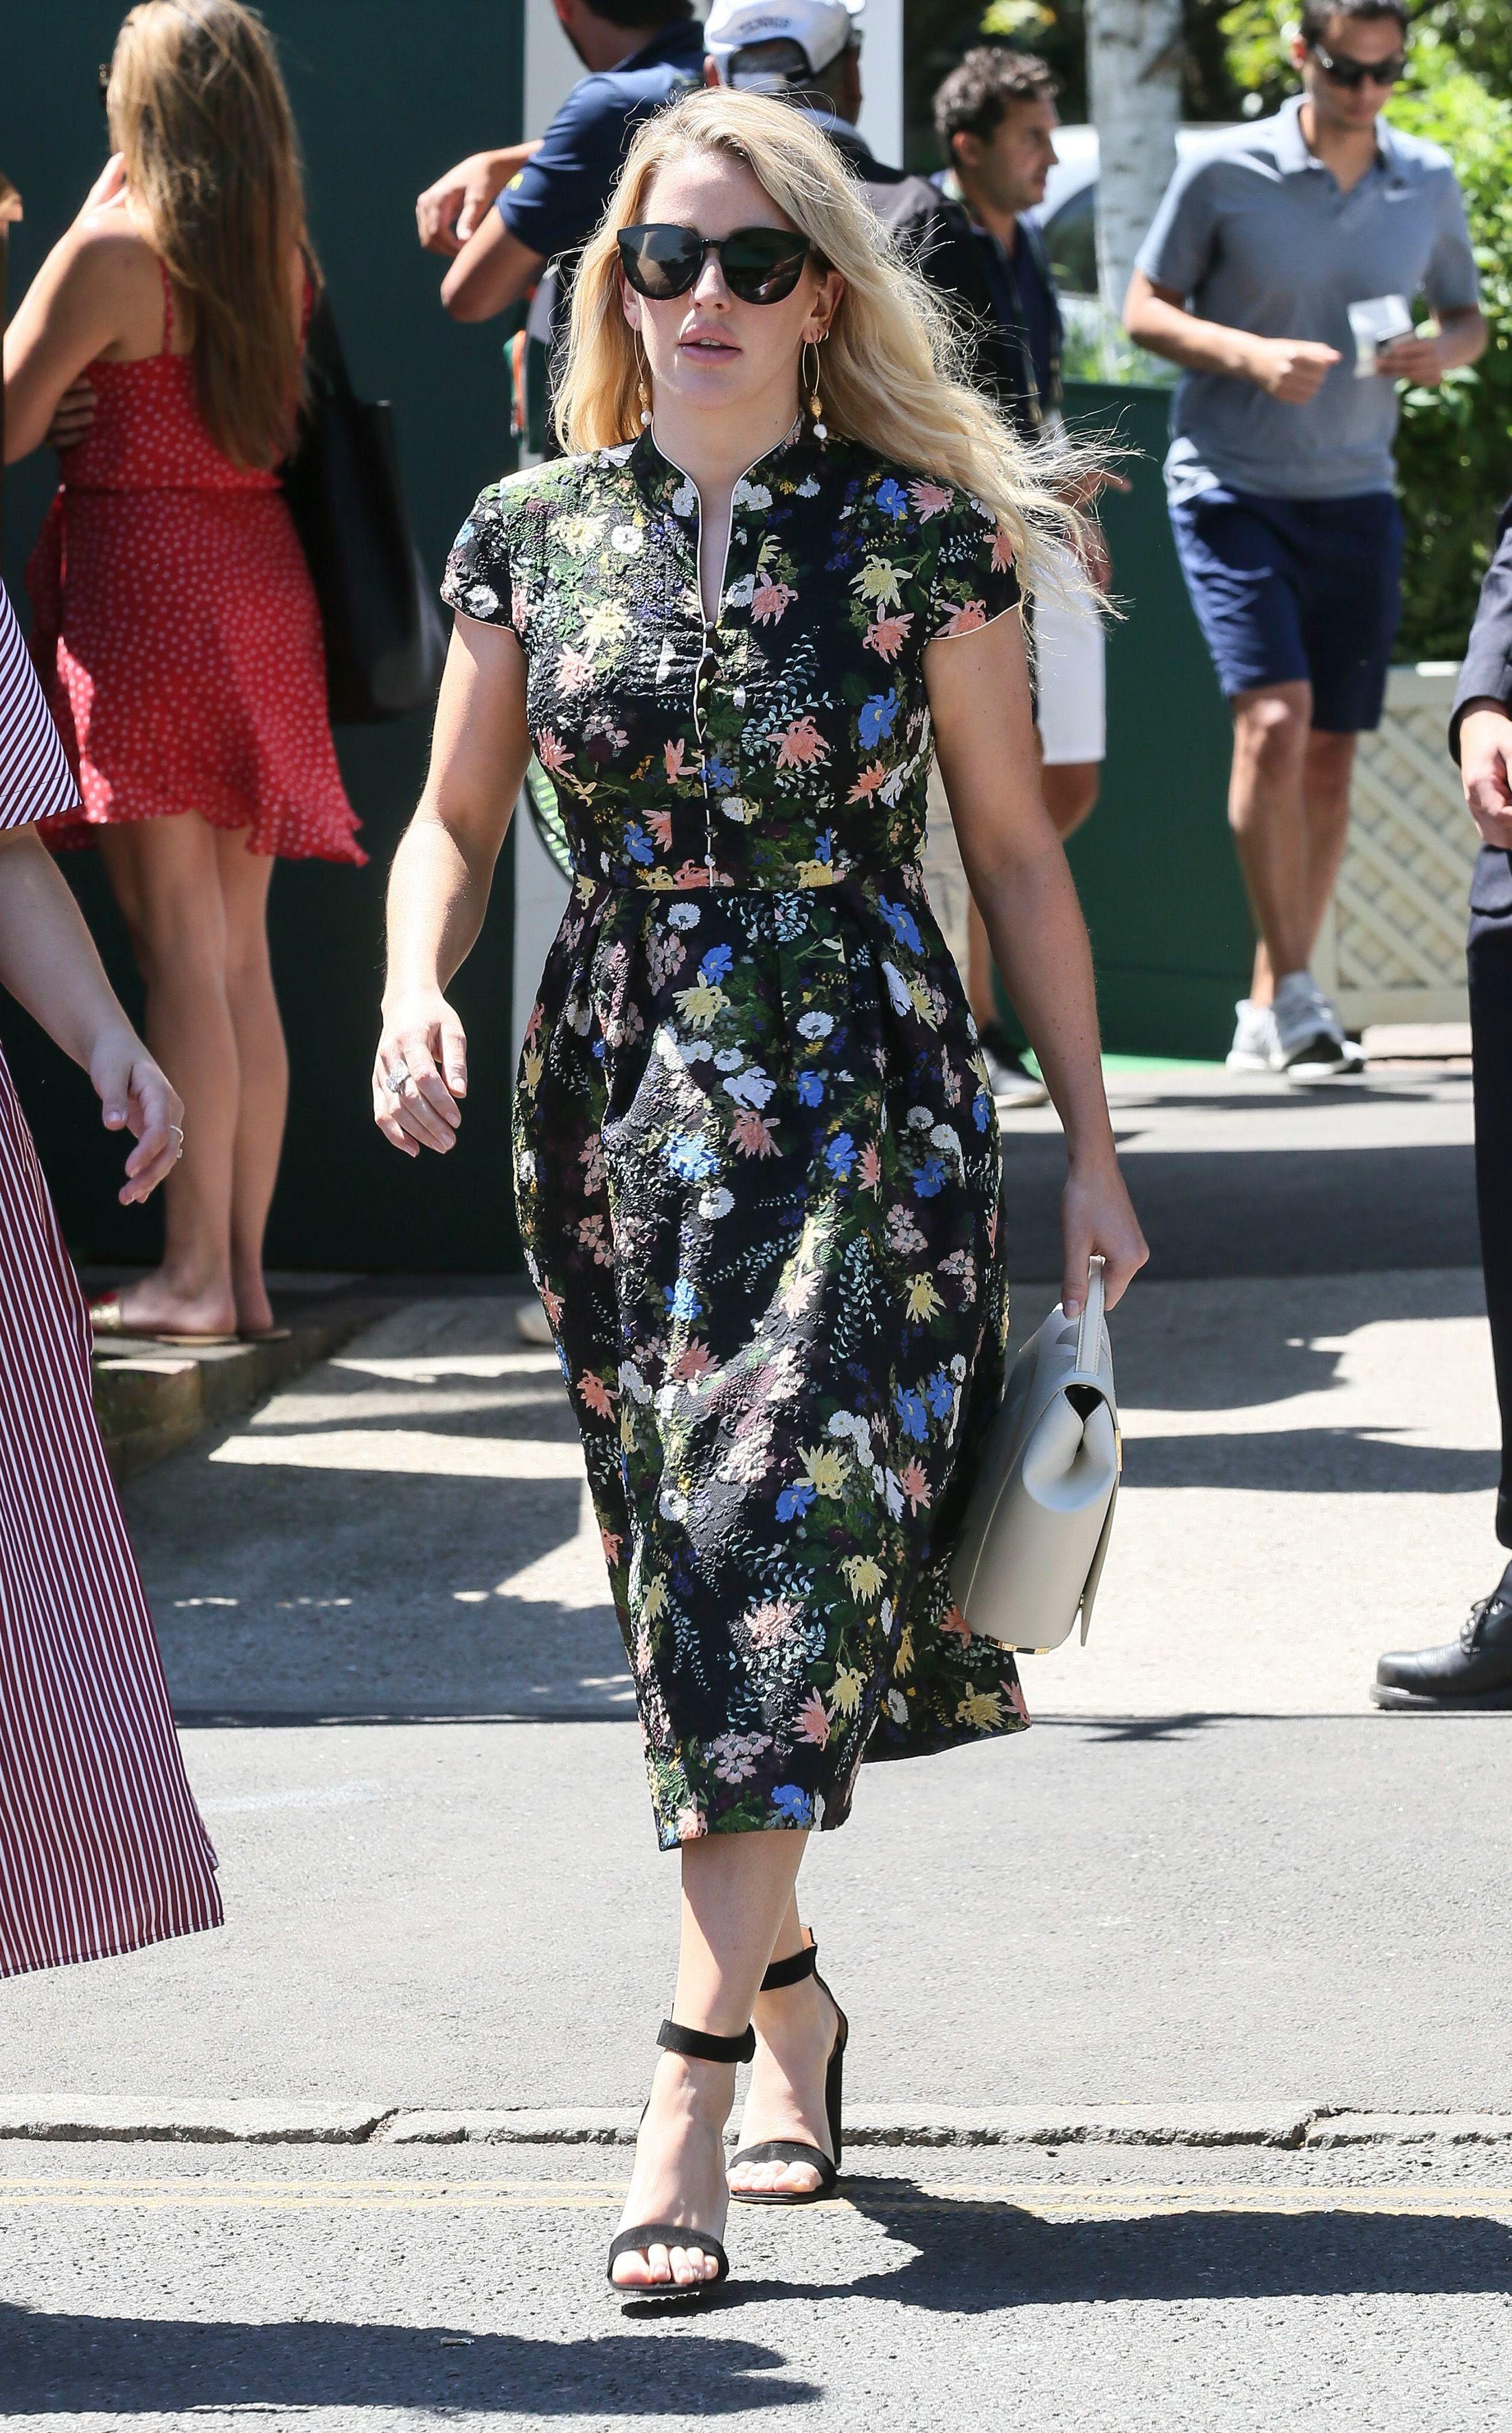 Ellie Goulding arrives at Wimbledon in London on July 2, 2018.